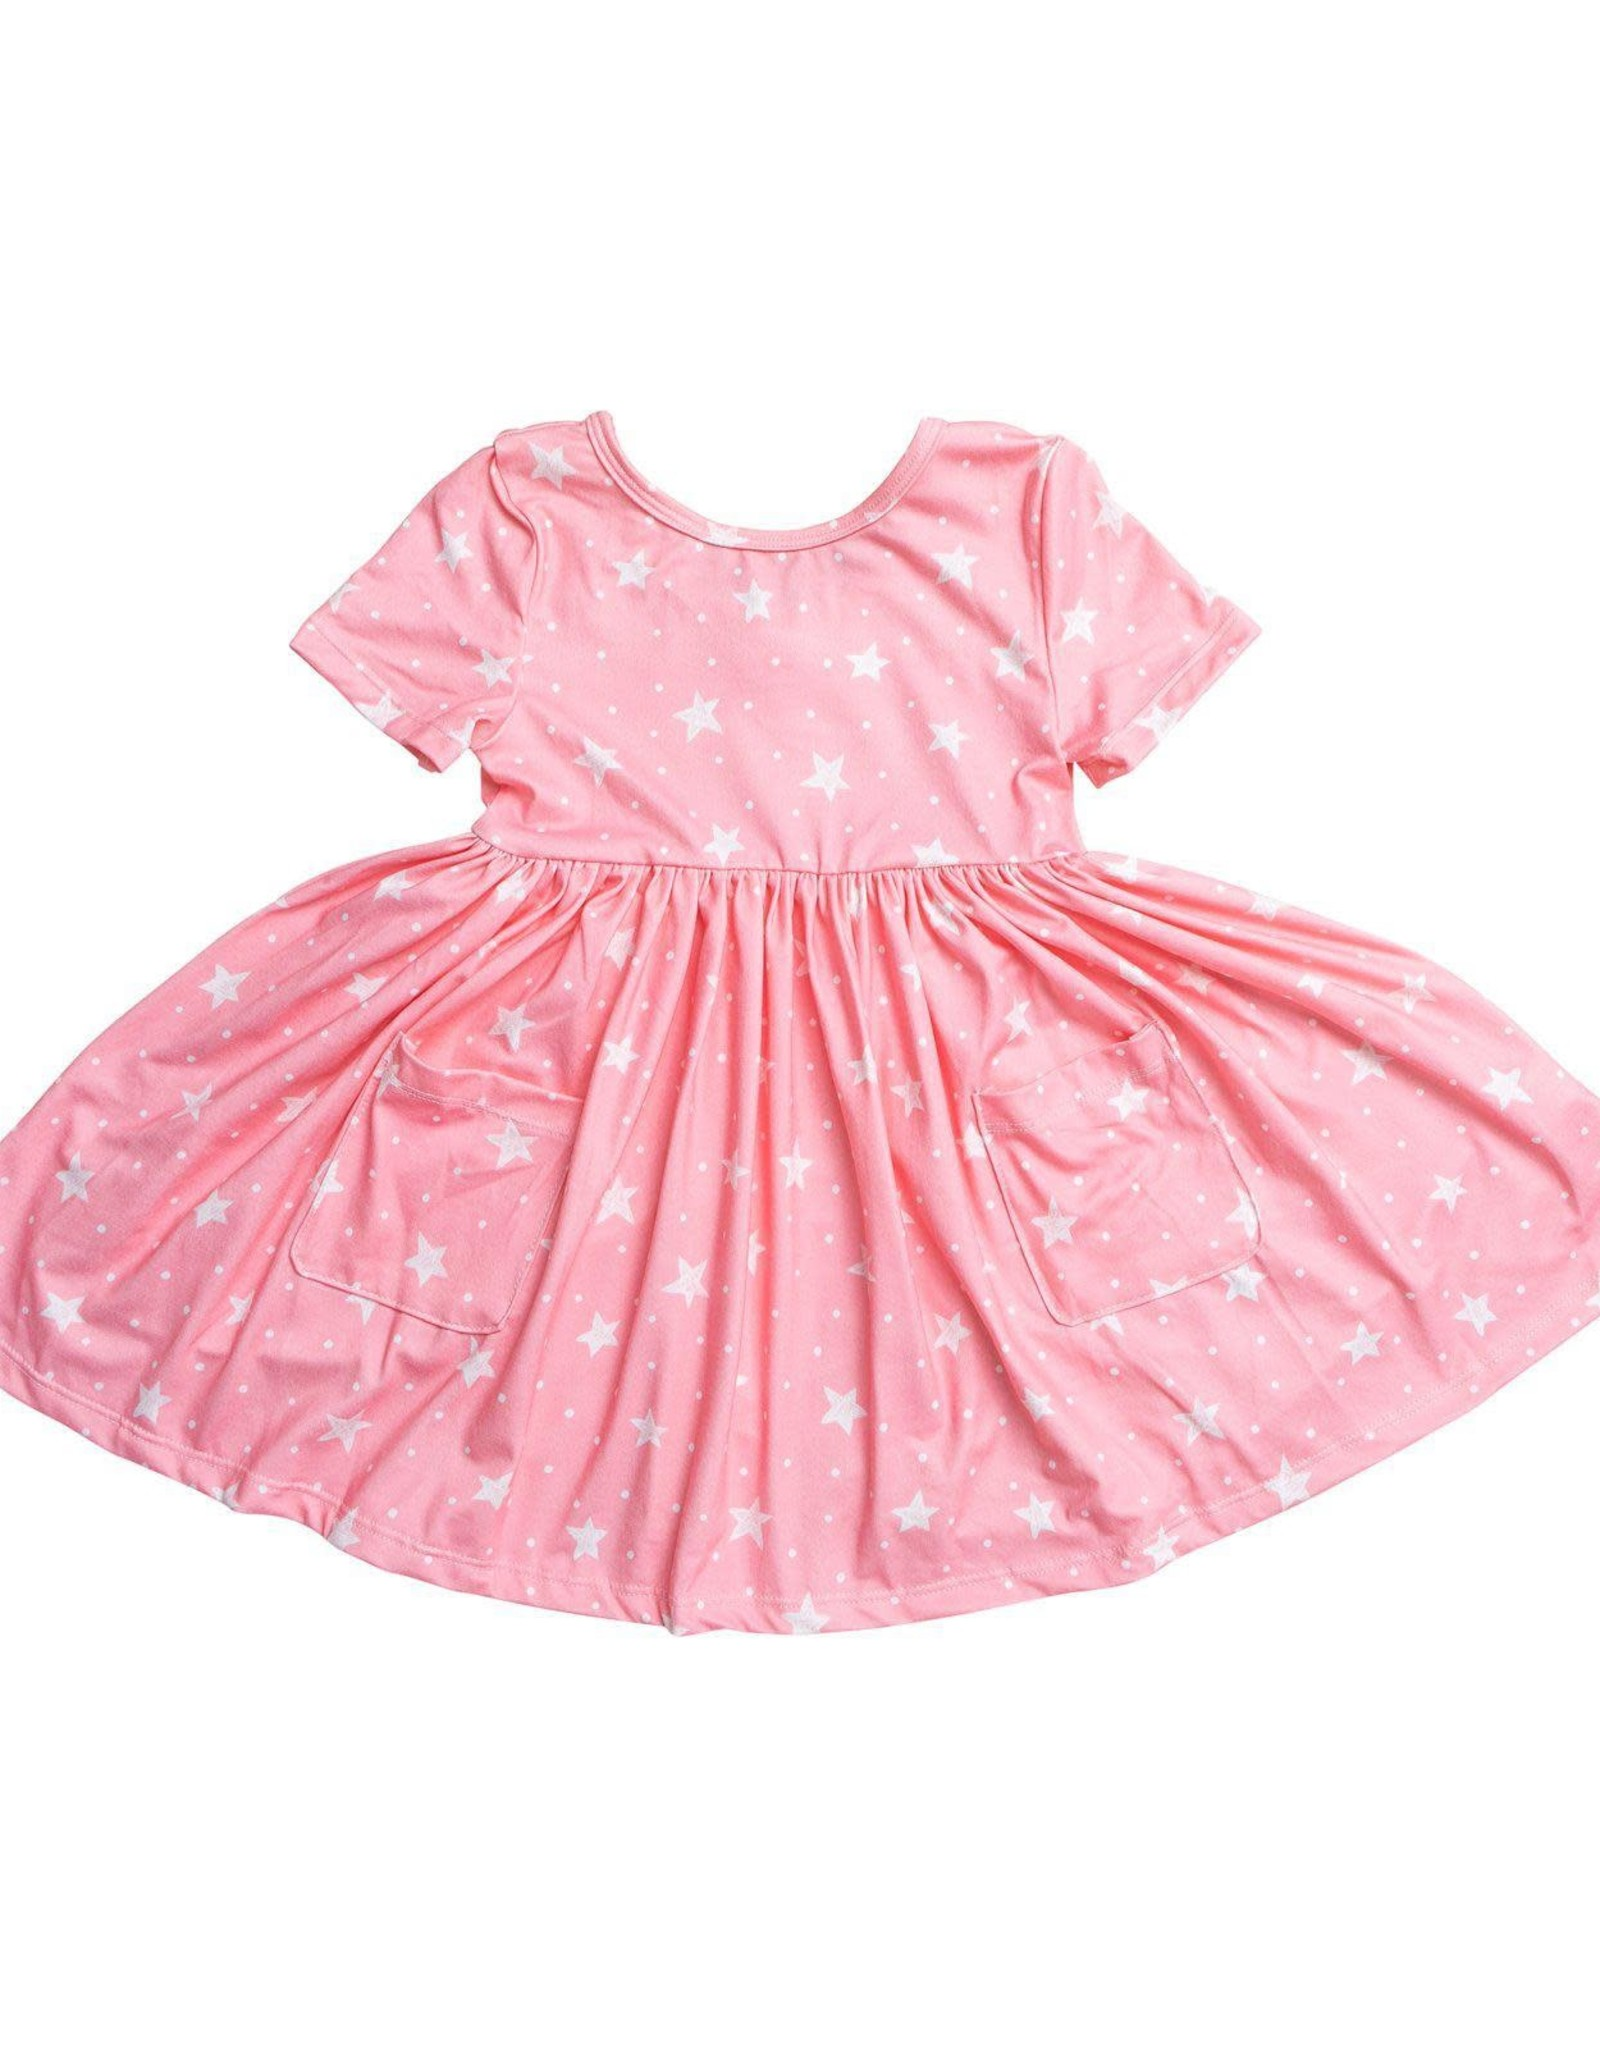 Mila & Rose Pink Star Pocket Twirl Dress, Short Sleeve